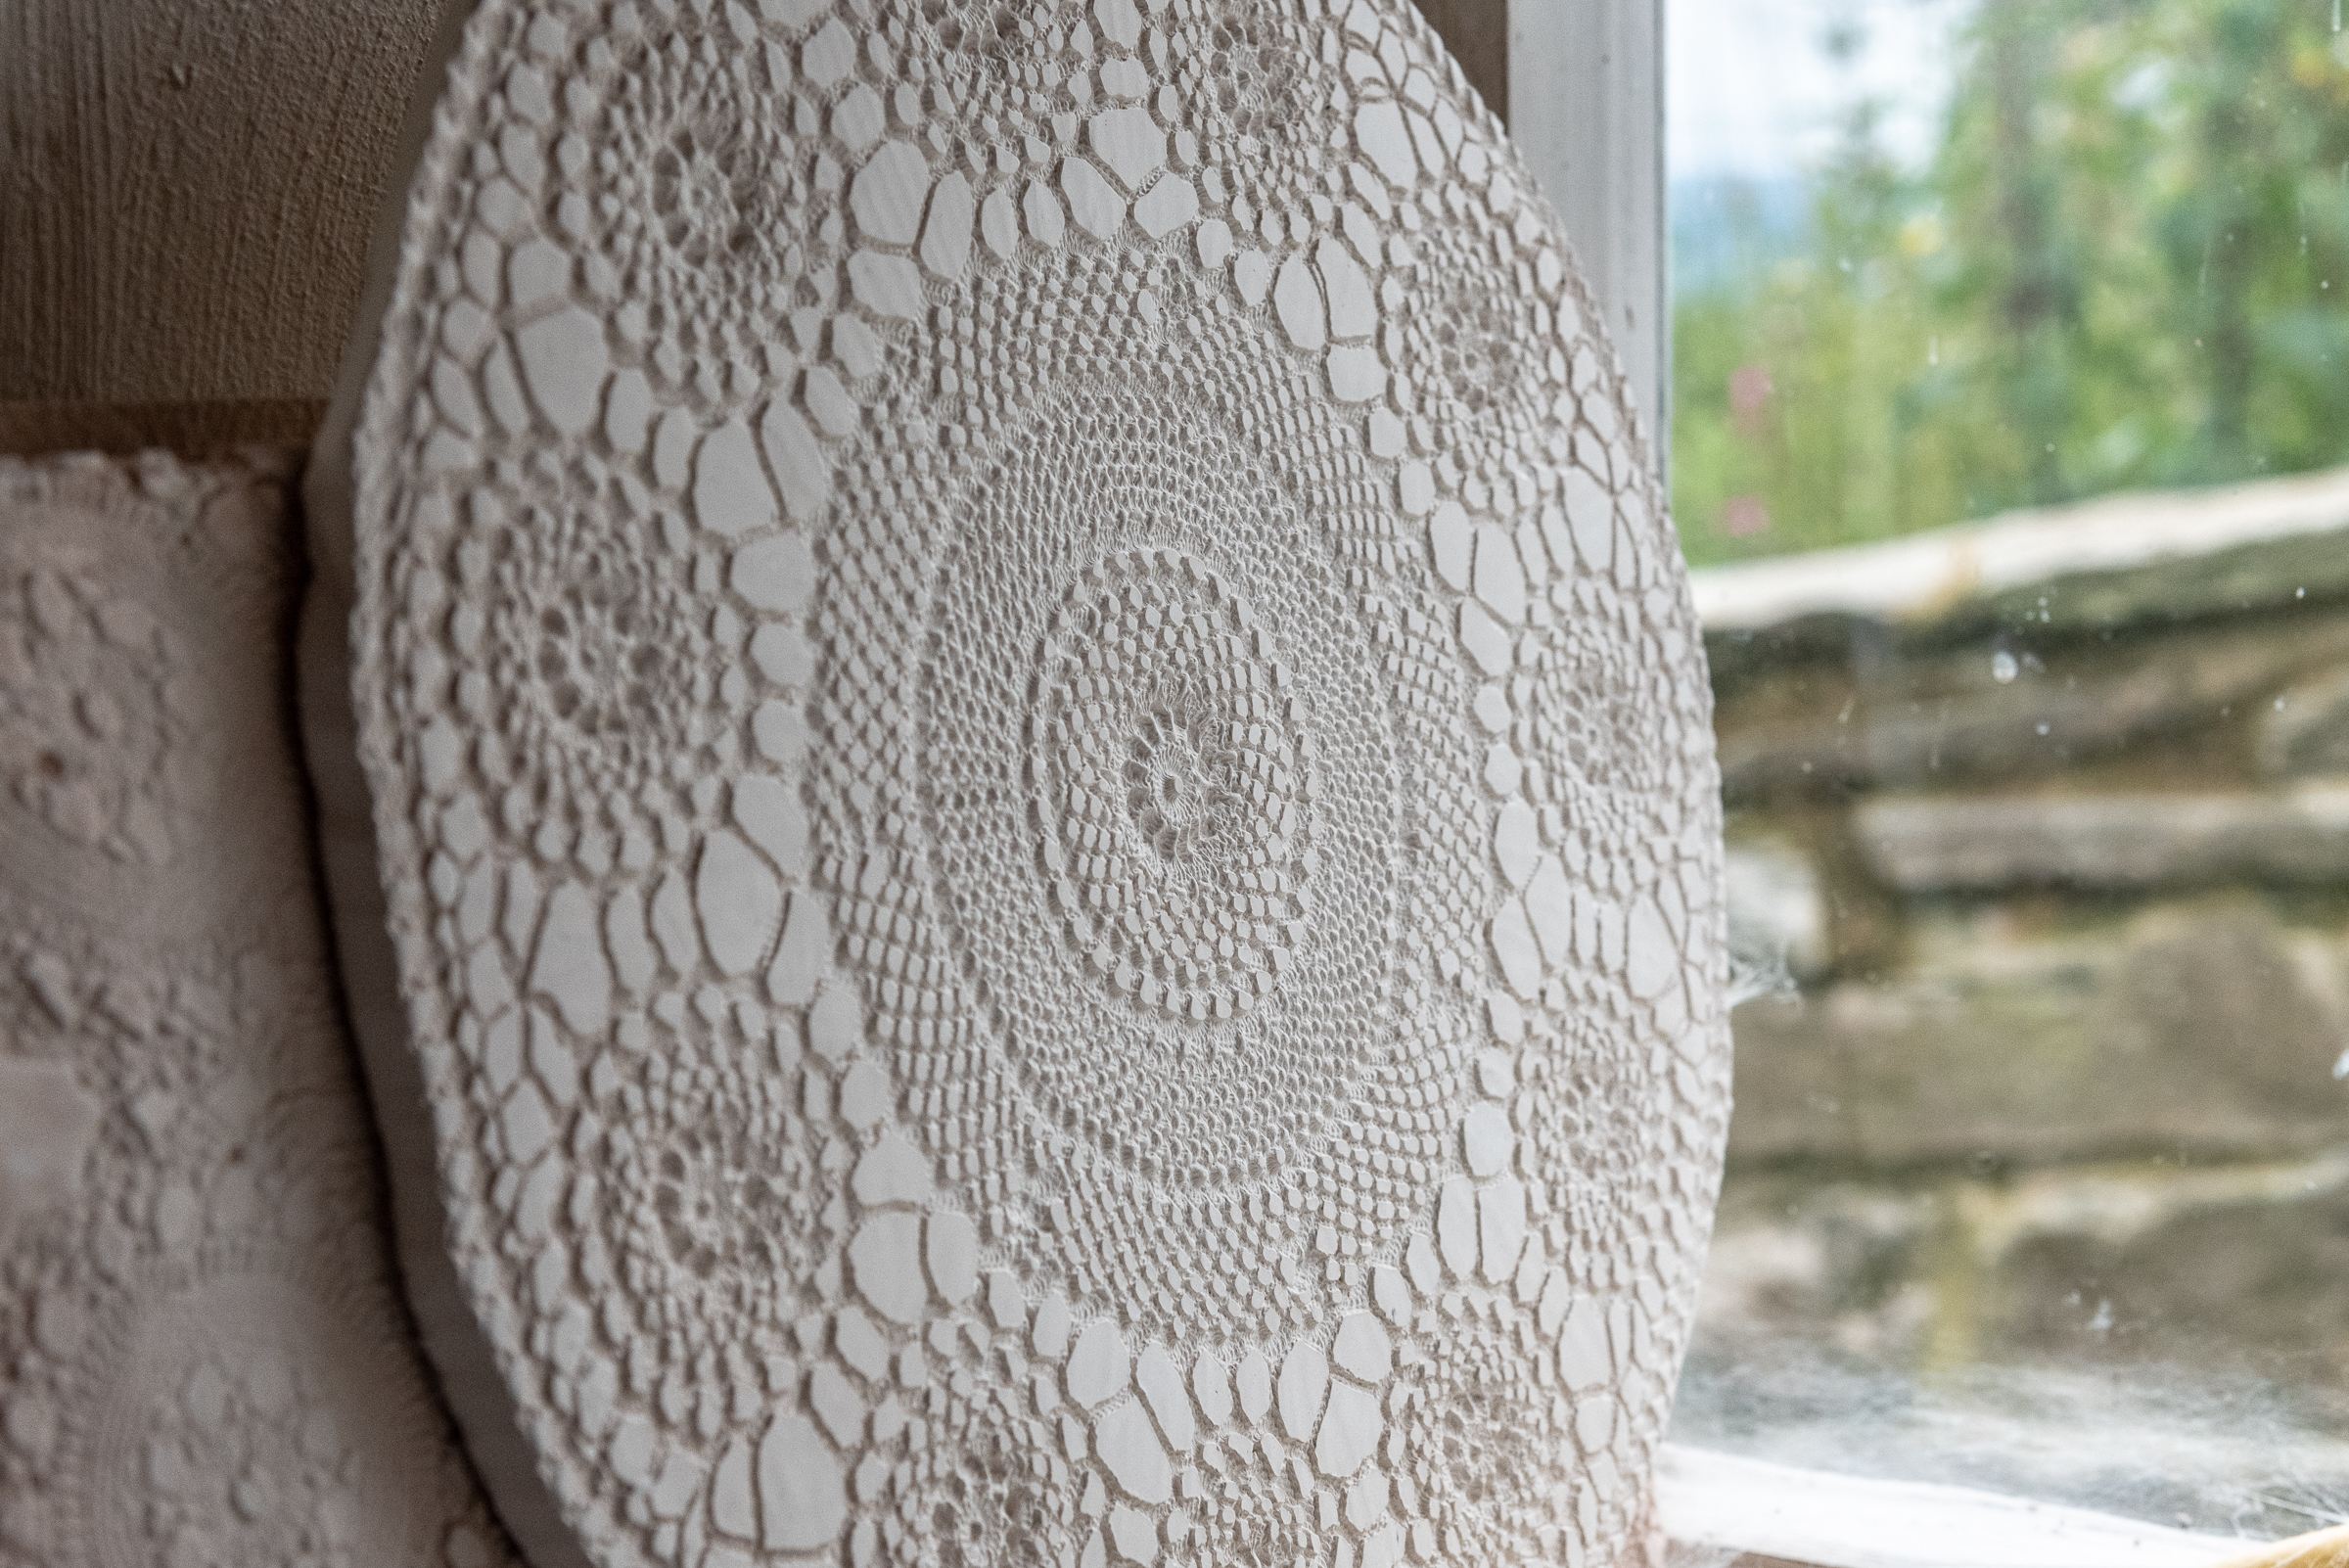 Cabalva-Pottery-2019-7581.jpg